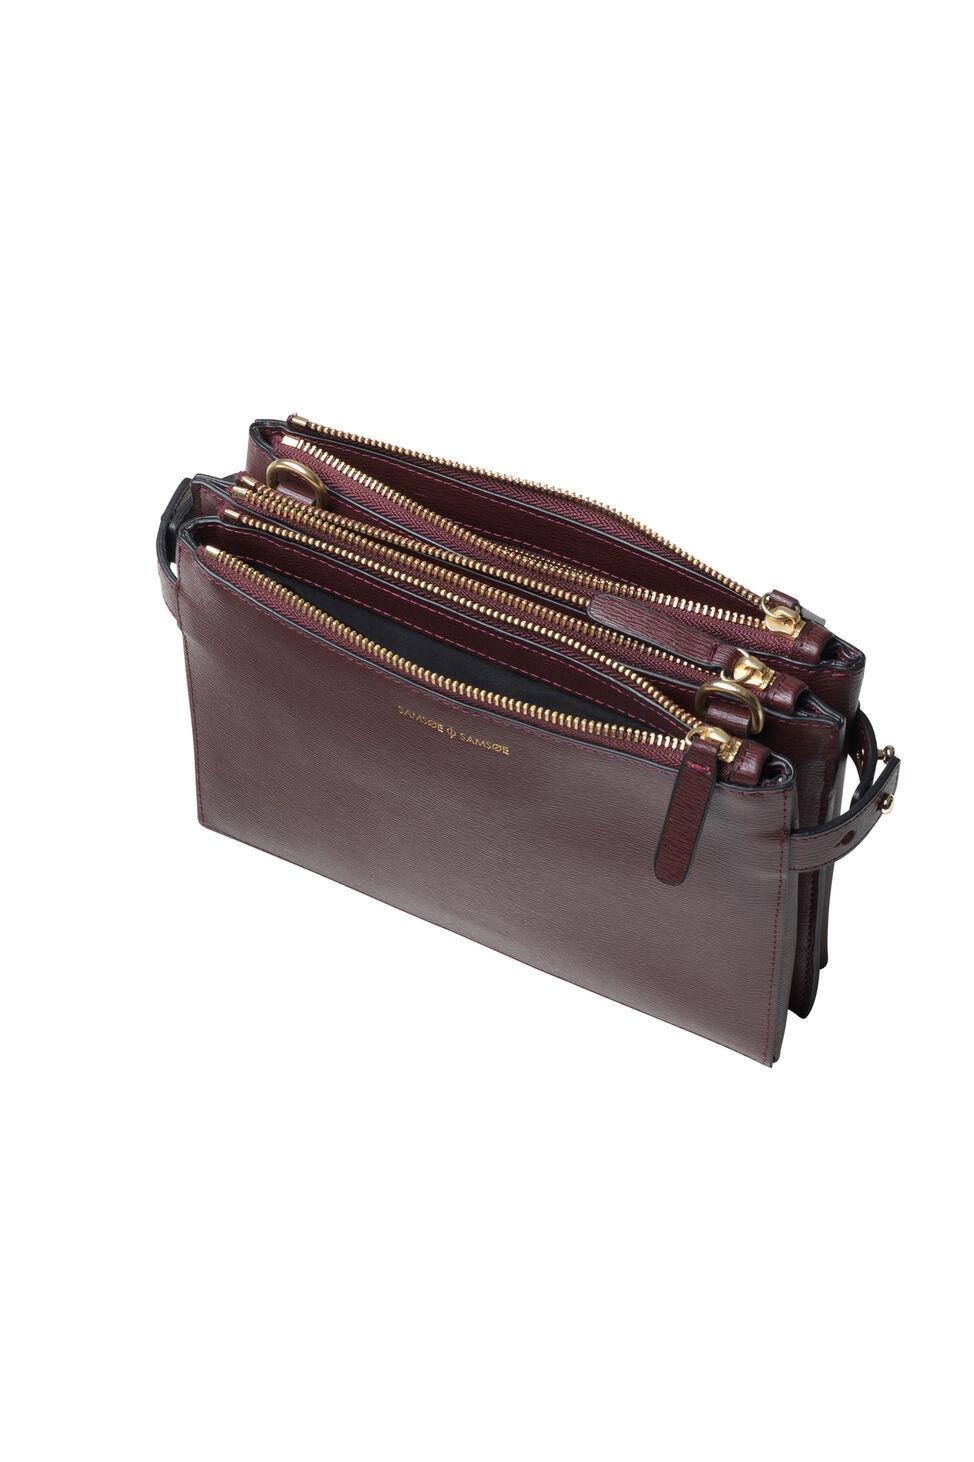 Ruby bag 9641